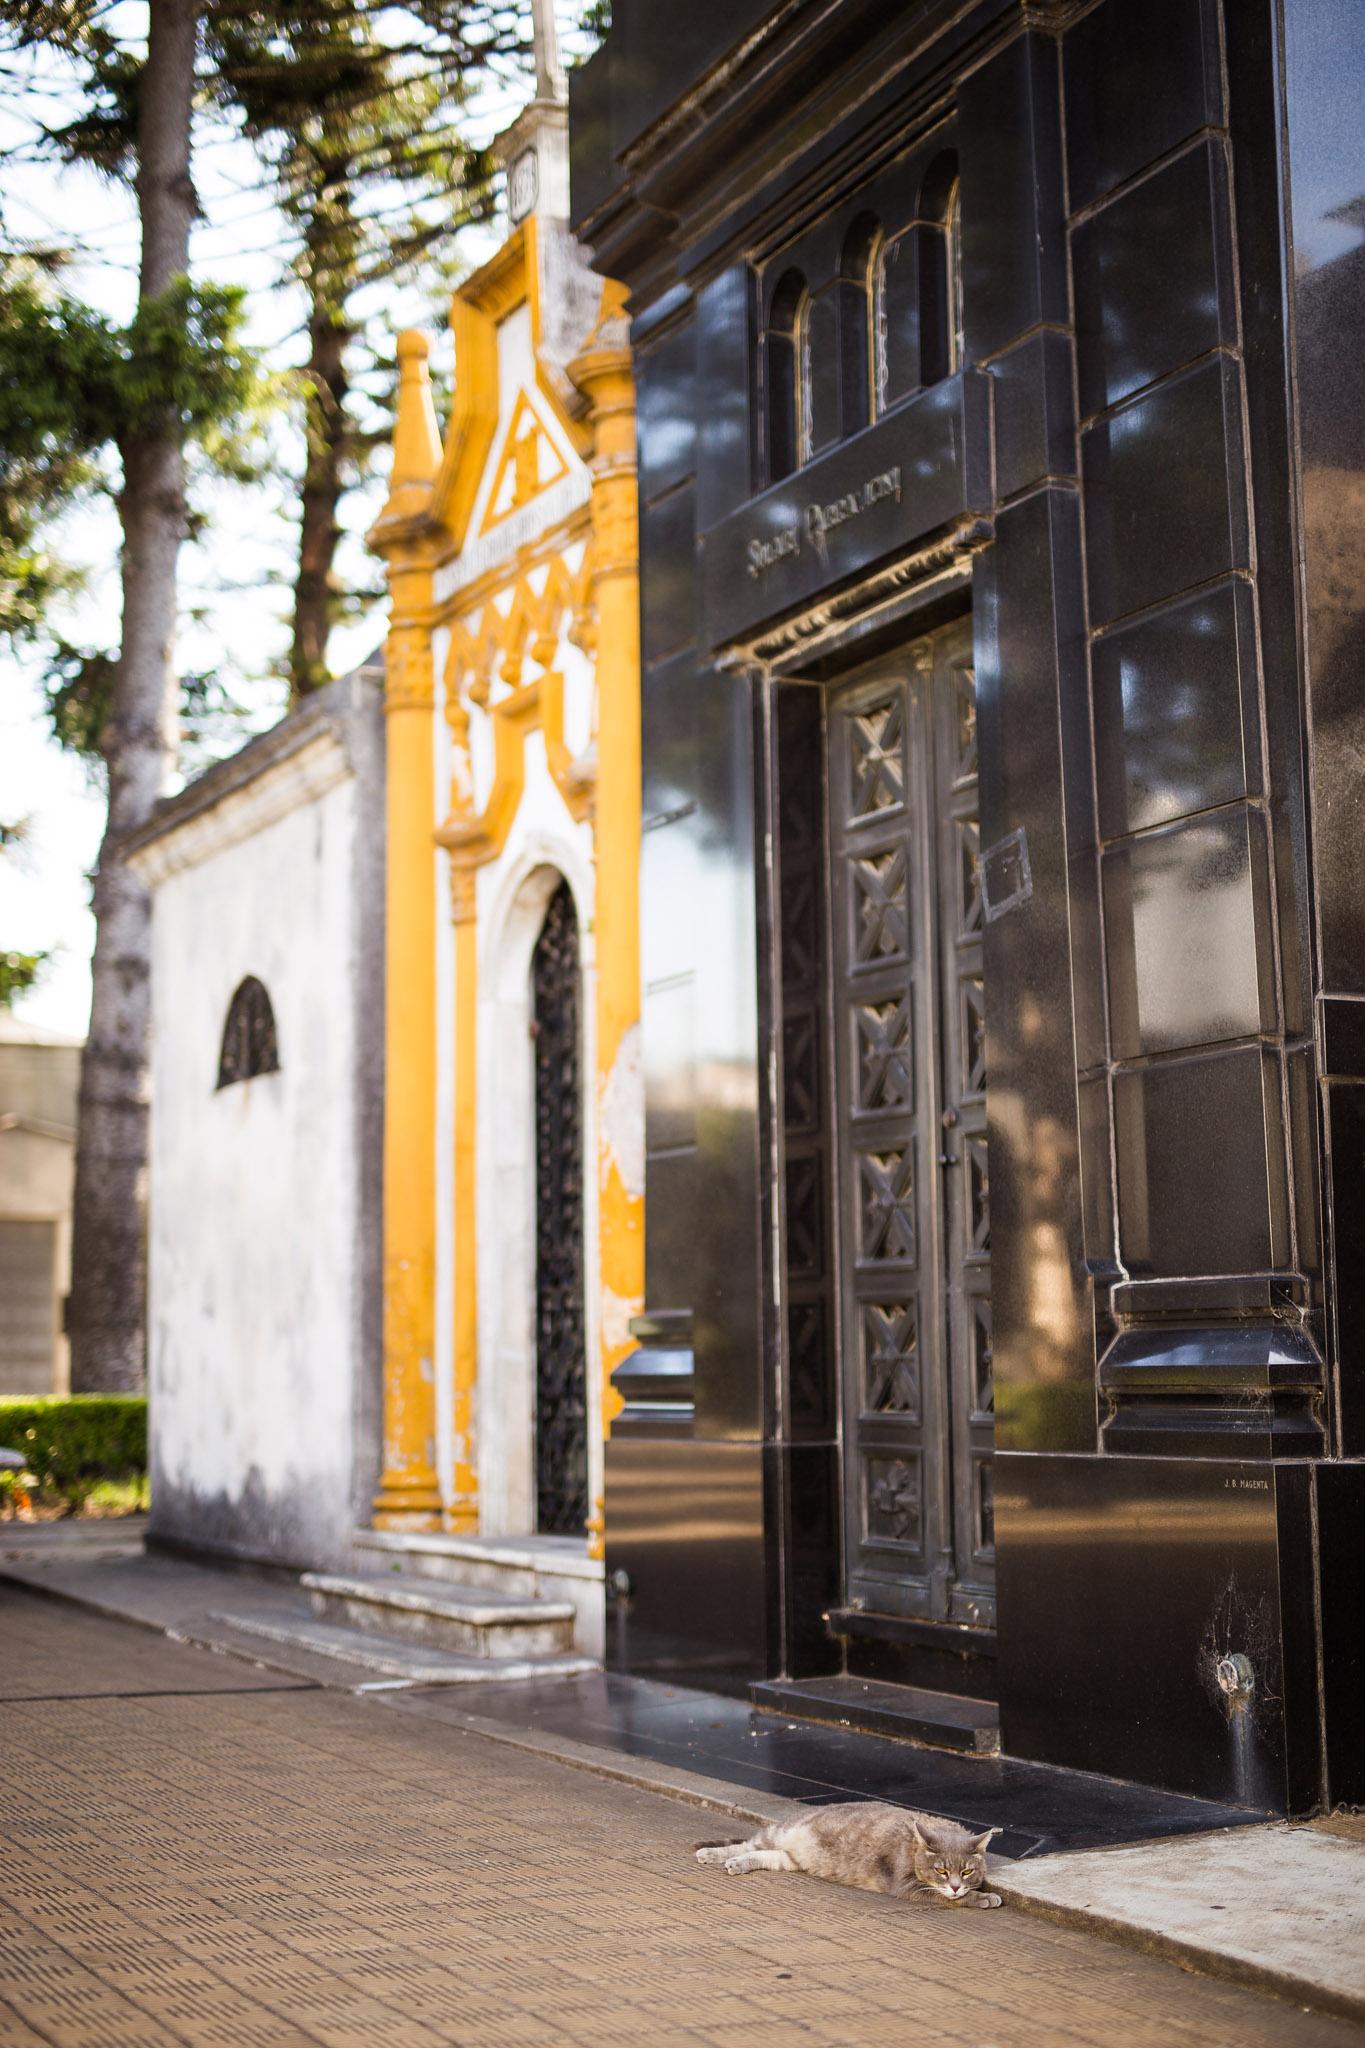 Wedding-travellers-Argentina-Buenos-Aires-Recoleta-cemetery-cat